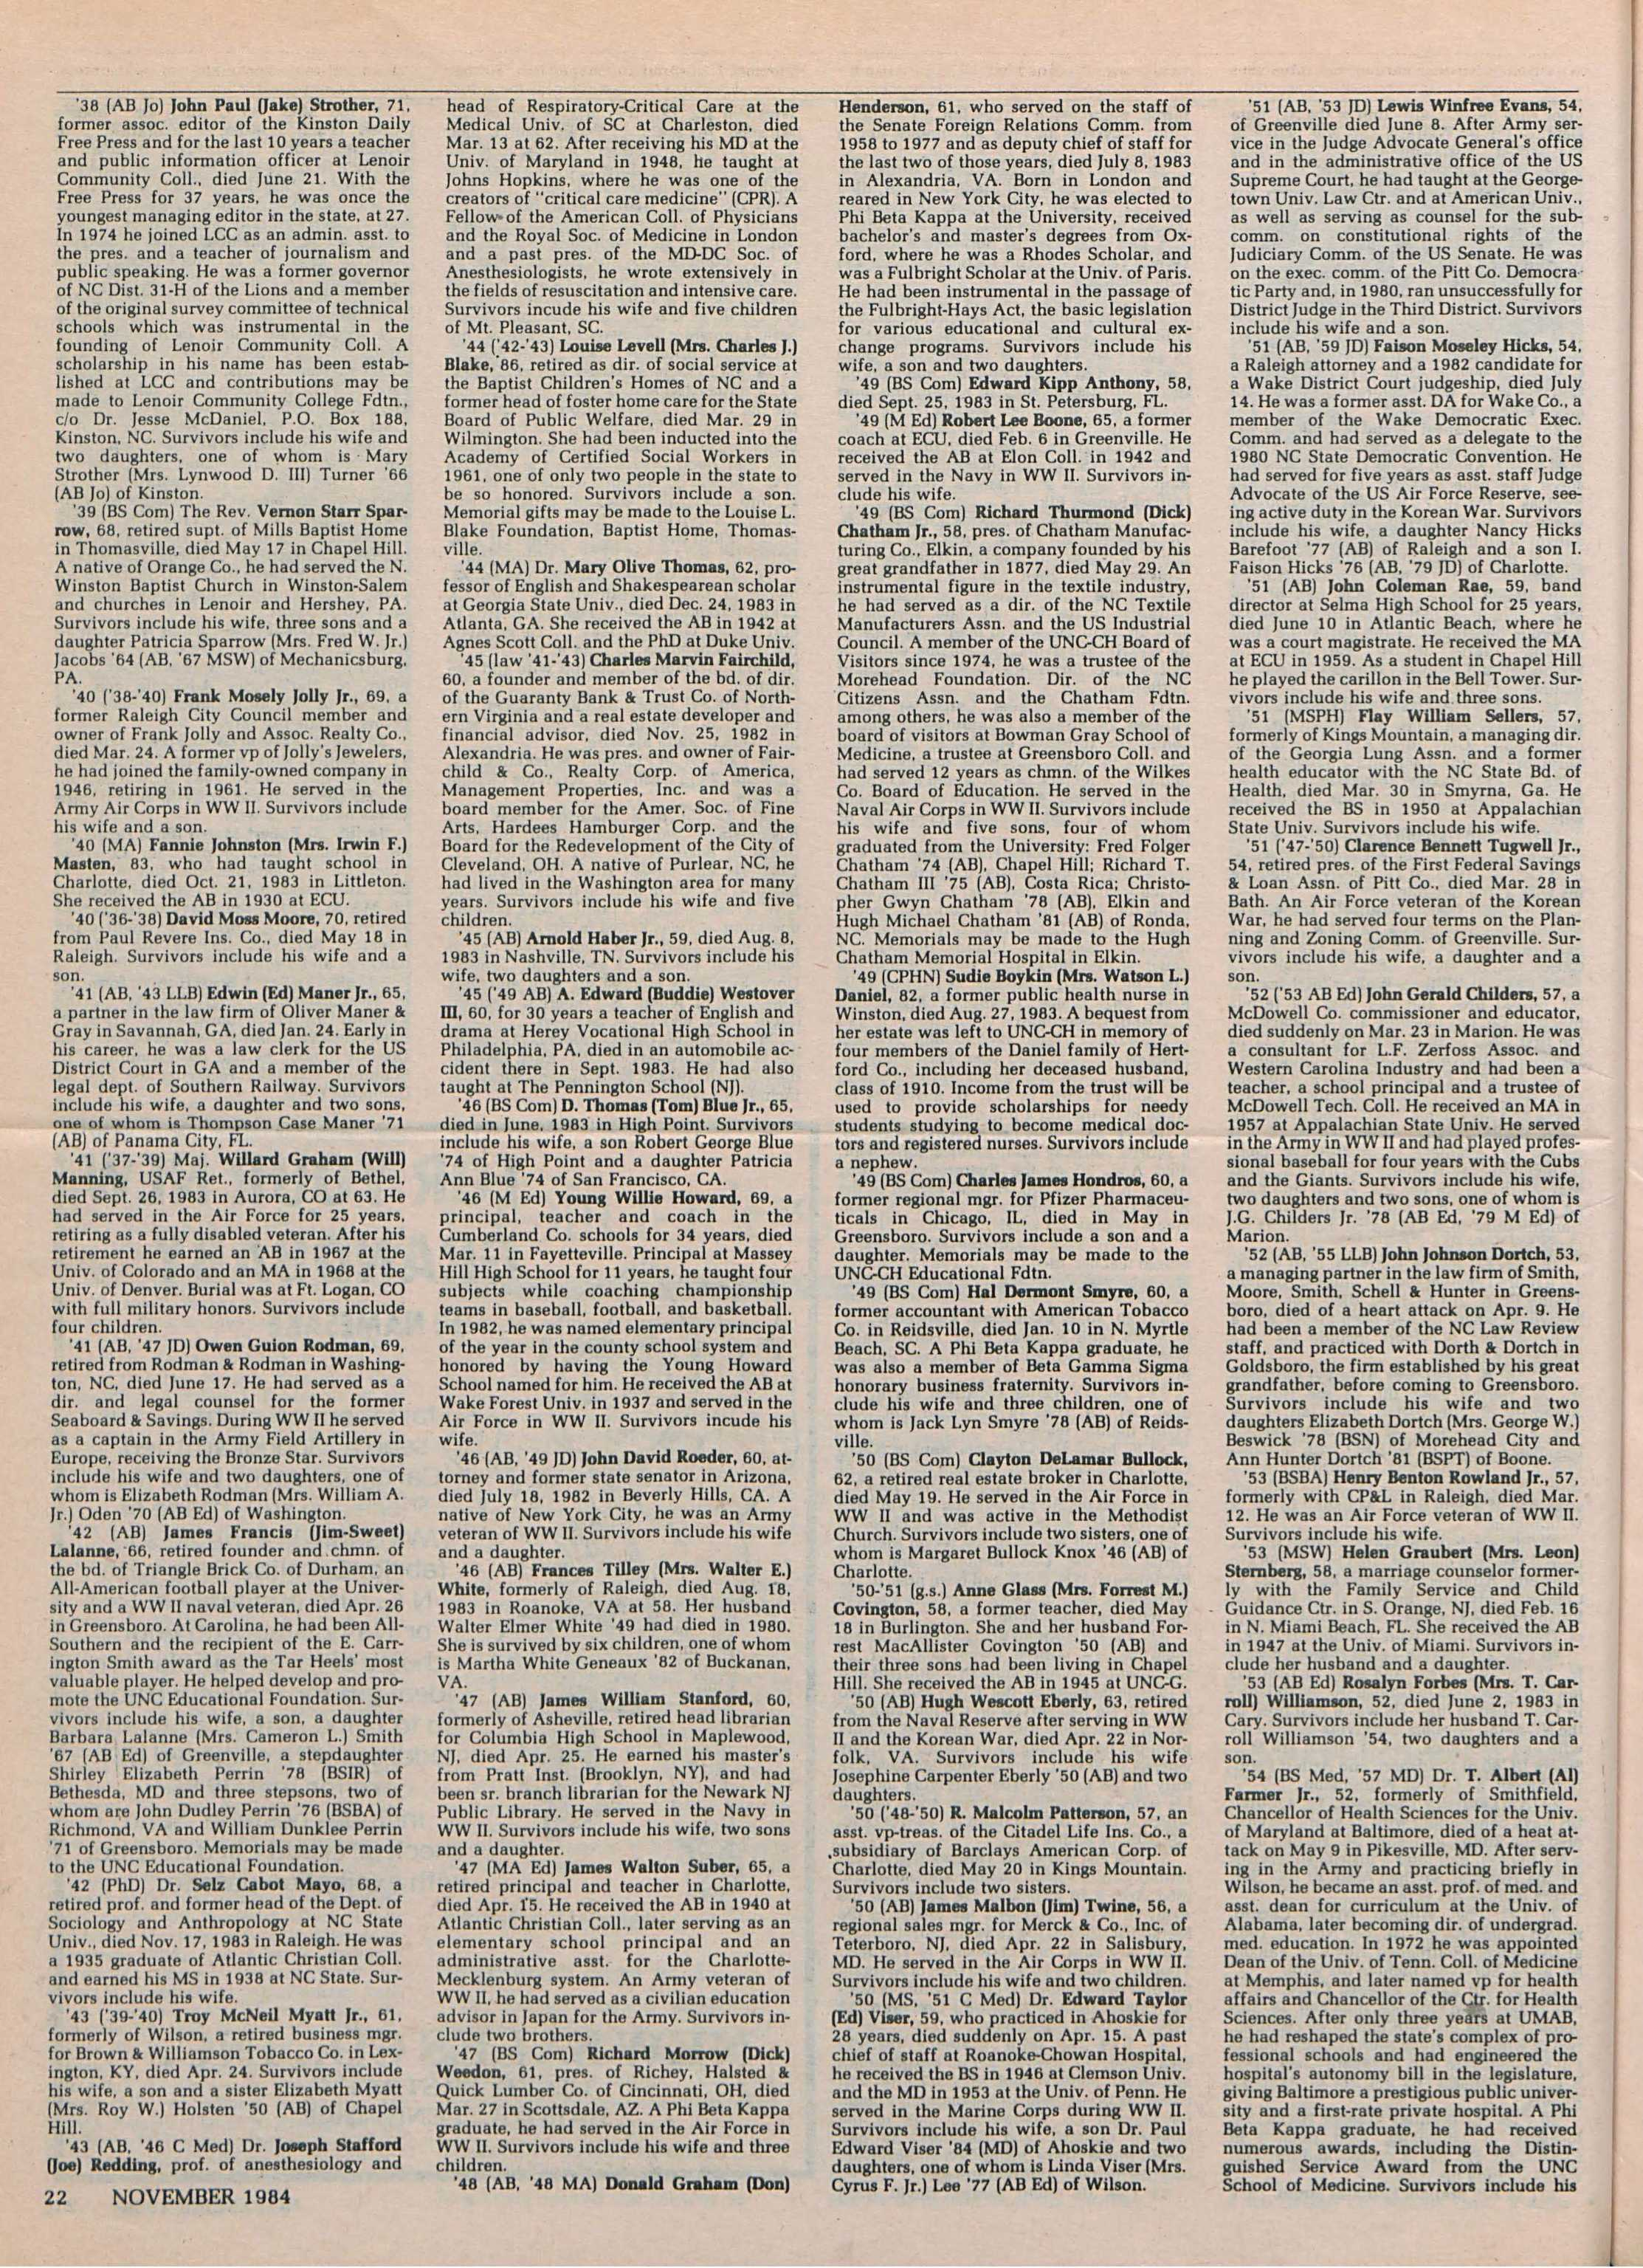 b49e231071a28 Carolina Alumni Review - November 1984 - page 22